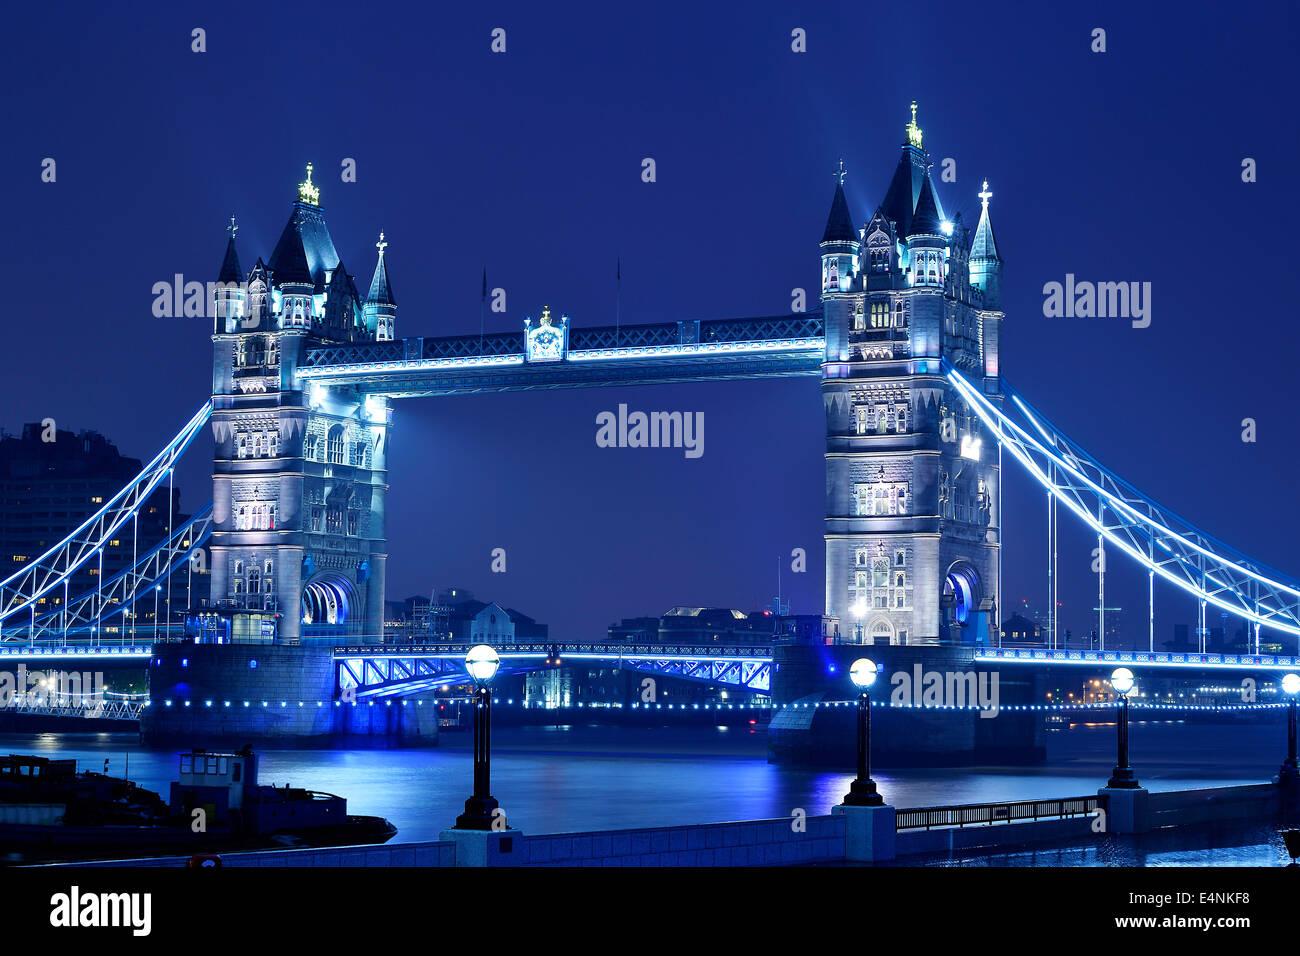 Nachtaufnahme Tower Bridge, London, England, Großbritannien - Stock Image